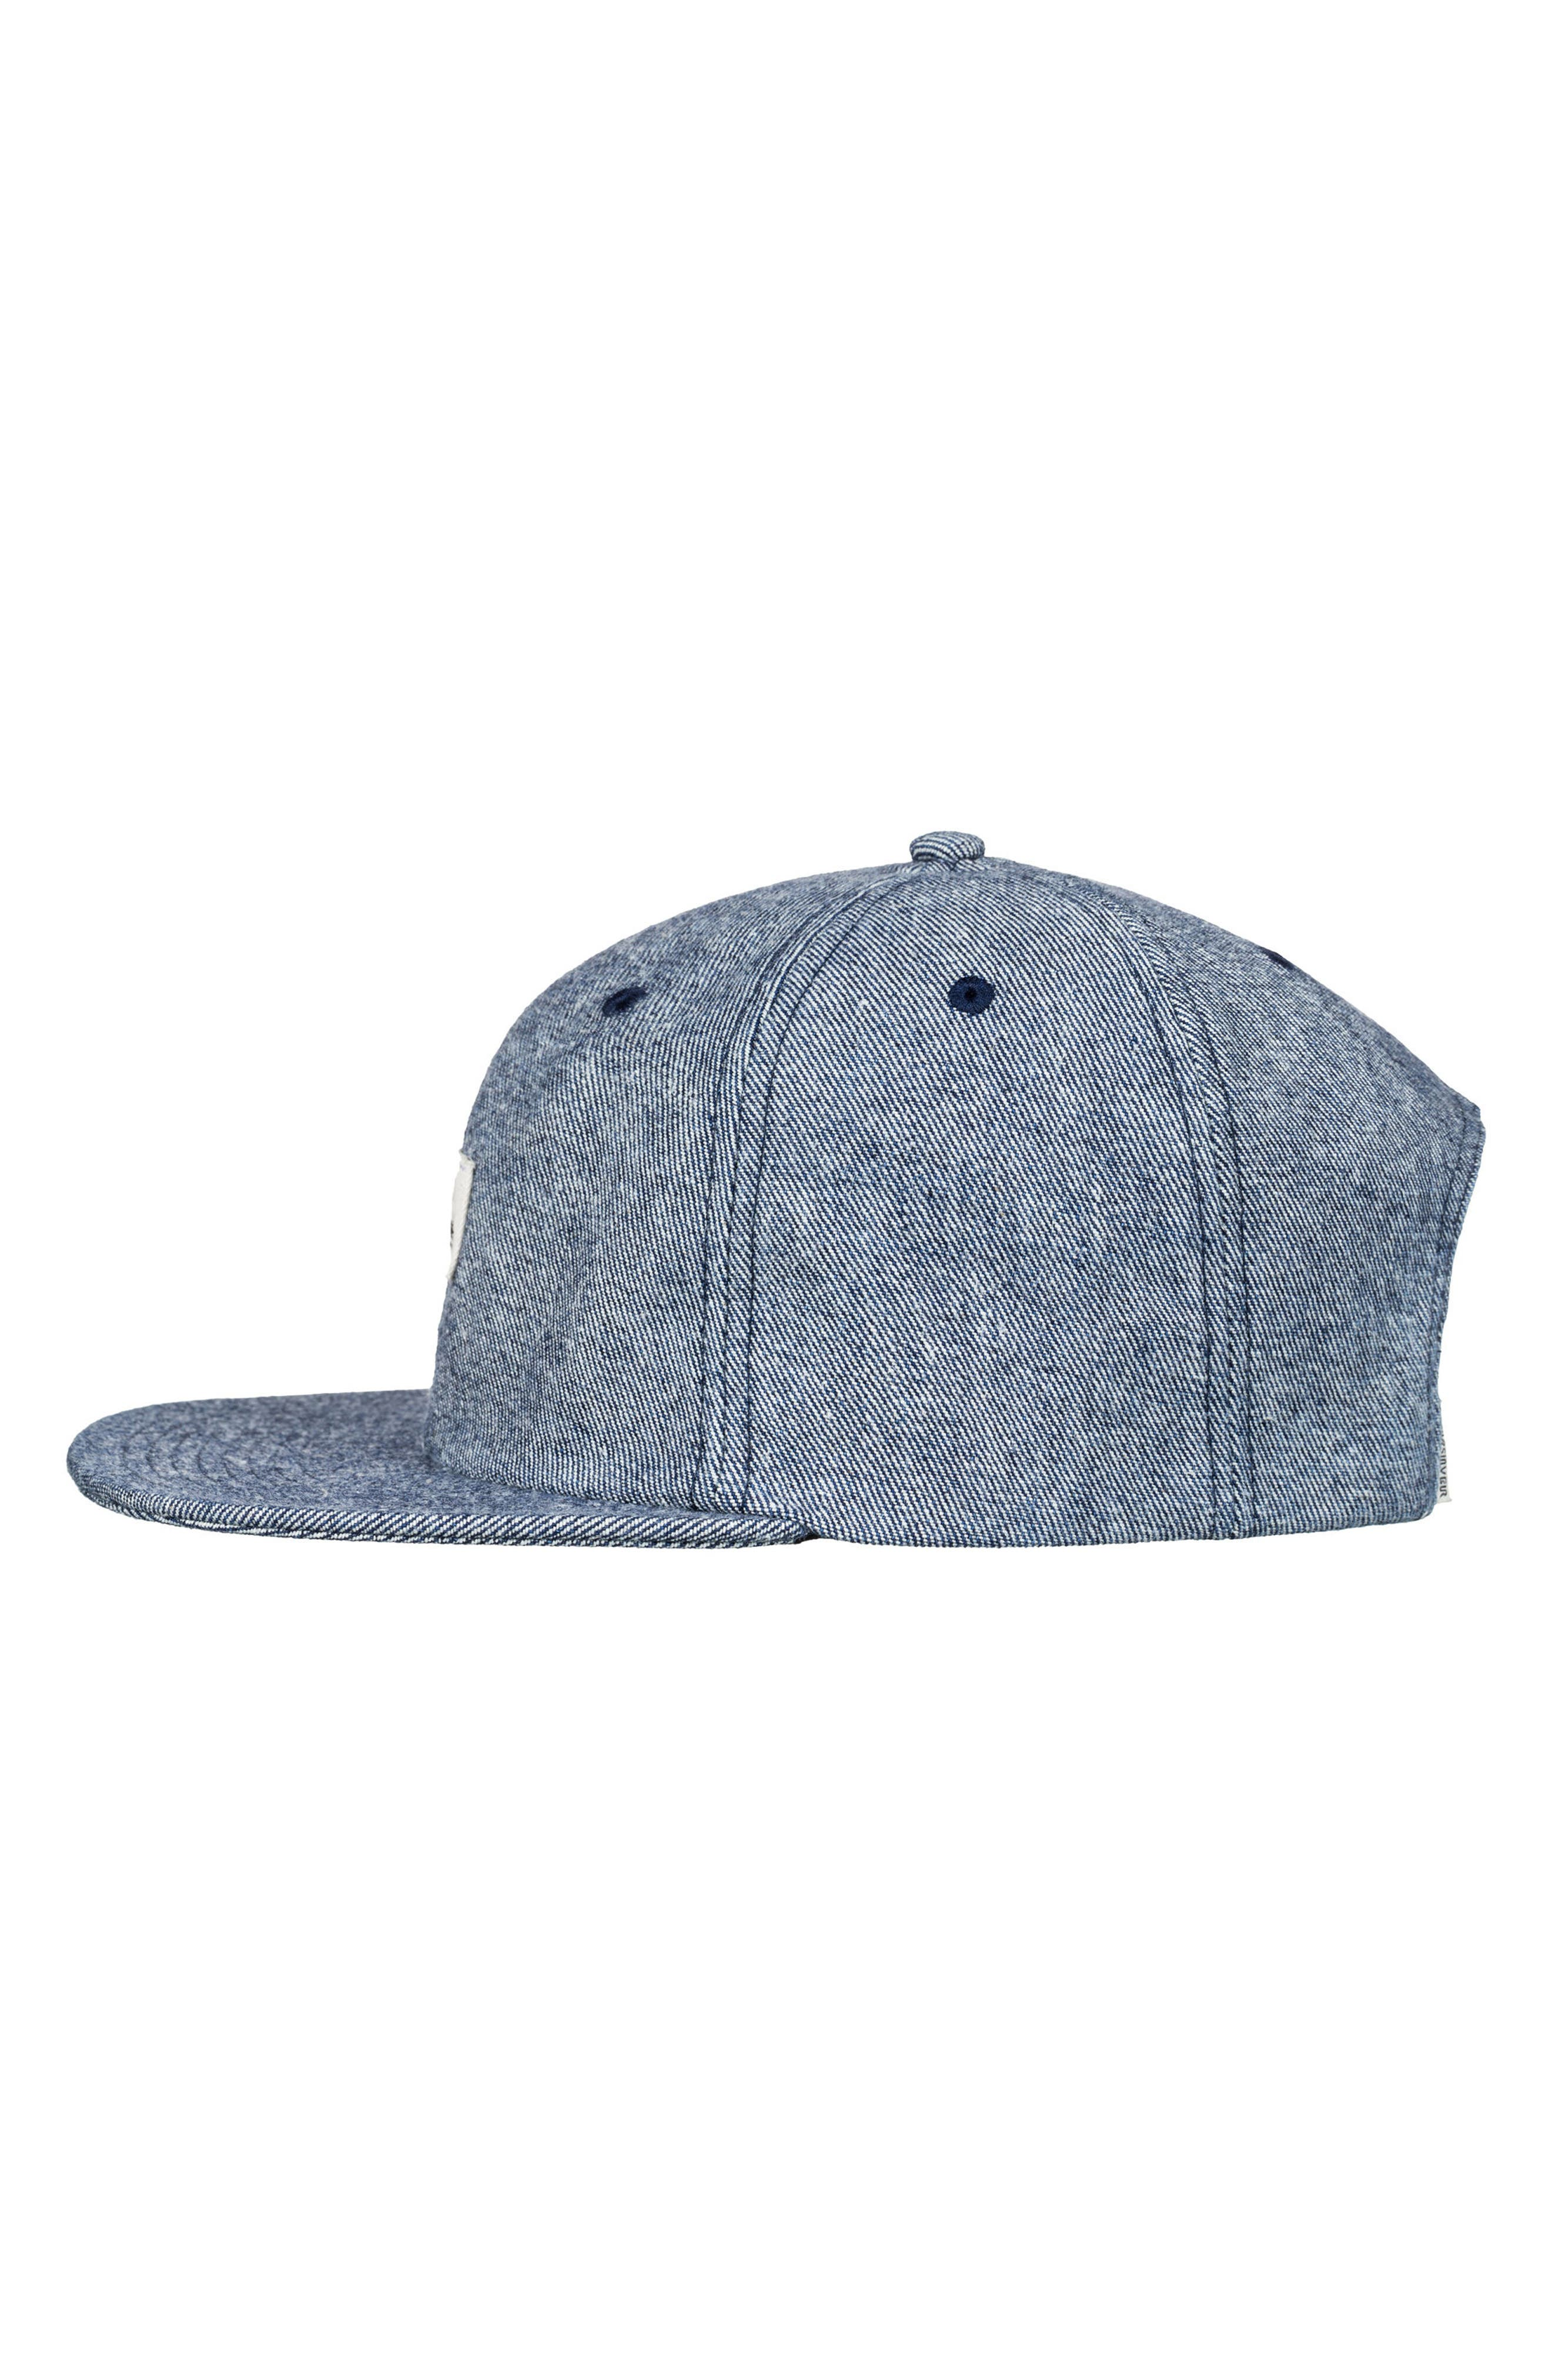 Pinchfield Snapback Baseball Cap,                             Alternate thumbnail 3, color,                             427